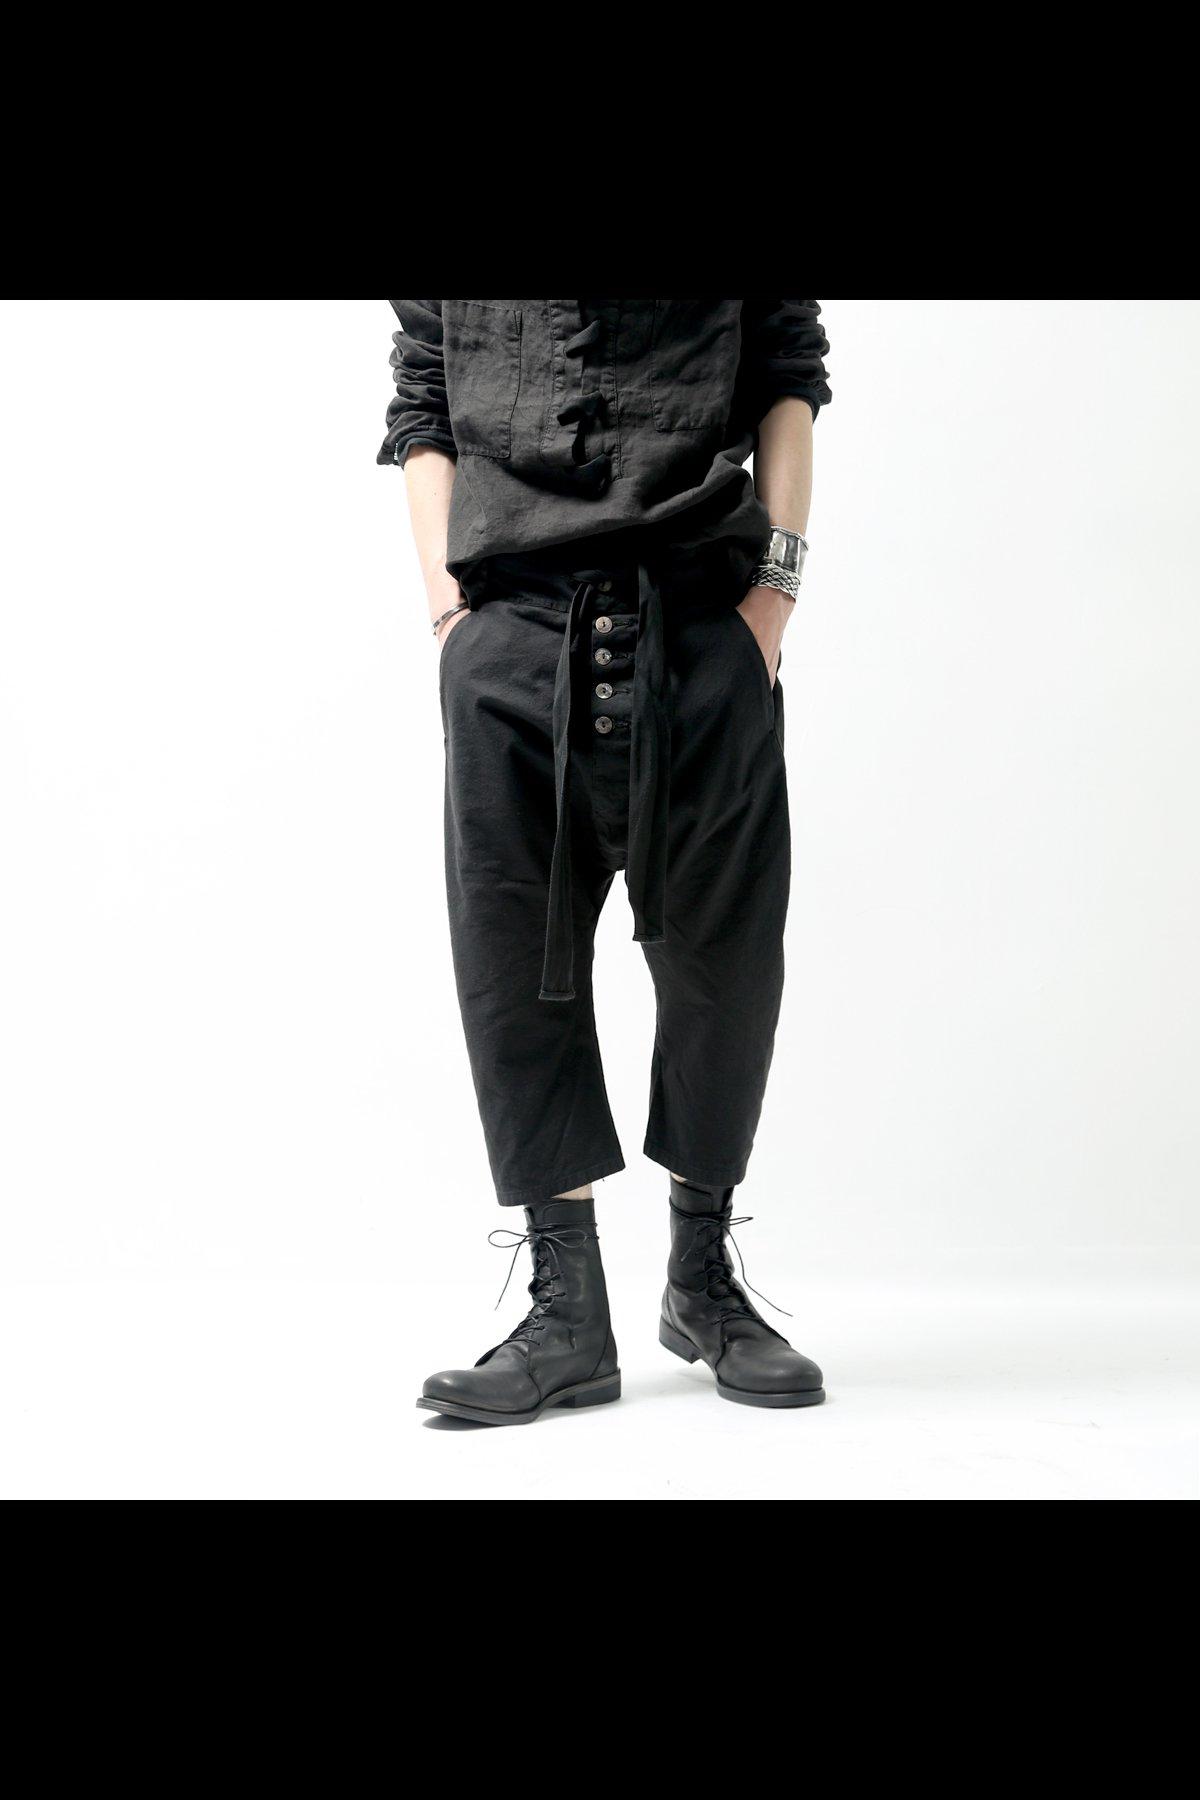 CROPPED LENGTH PANTS 26.02.01_BLACK